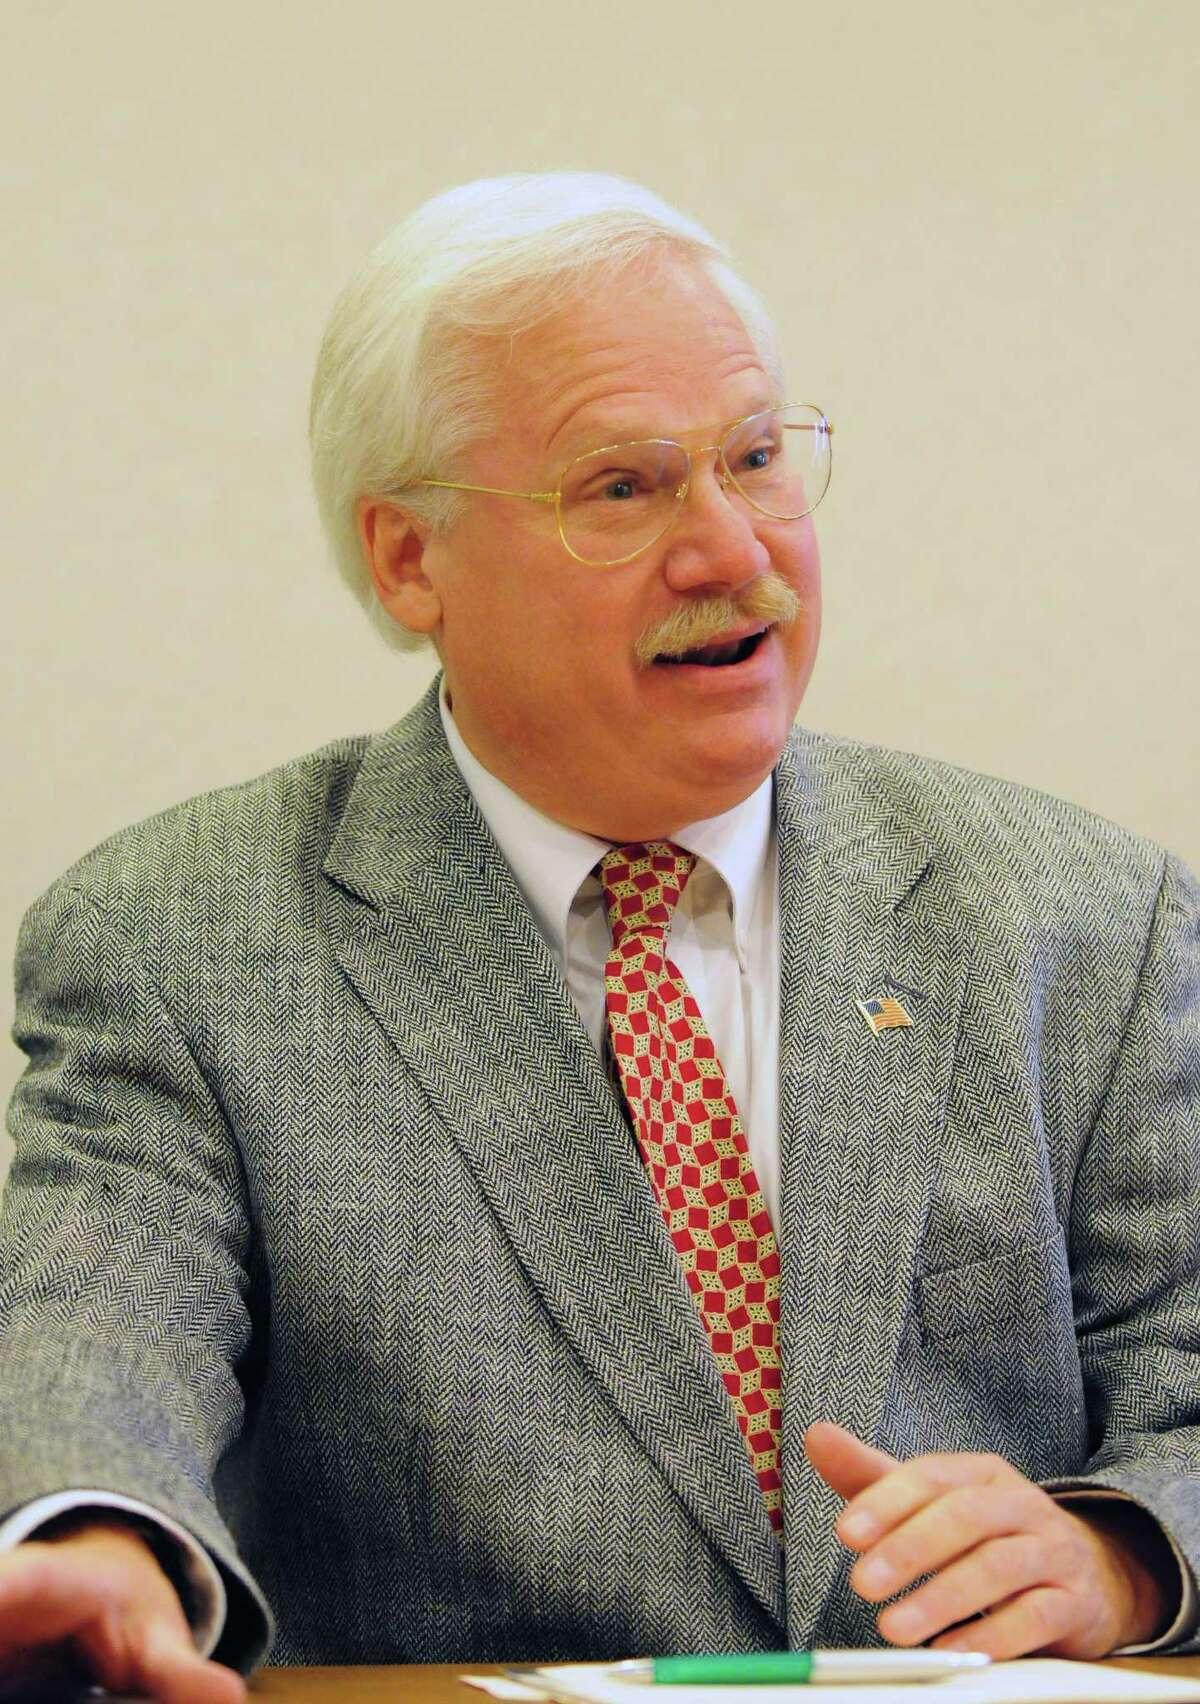 Albany County District 10 Legislator Gary W. Domalewicz (D) Tuesday, Aug. 27, 2013, in Colonie, N.Y. (Will Waldron/Times Union)